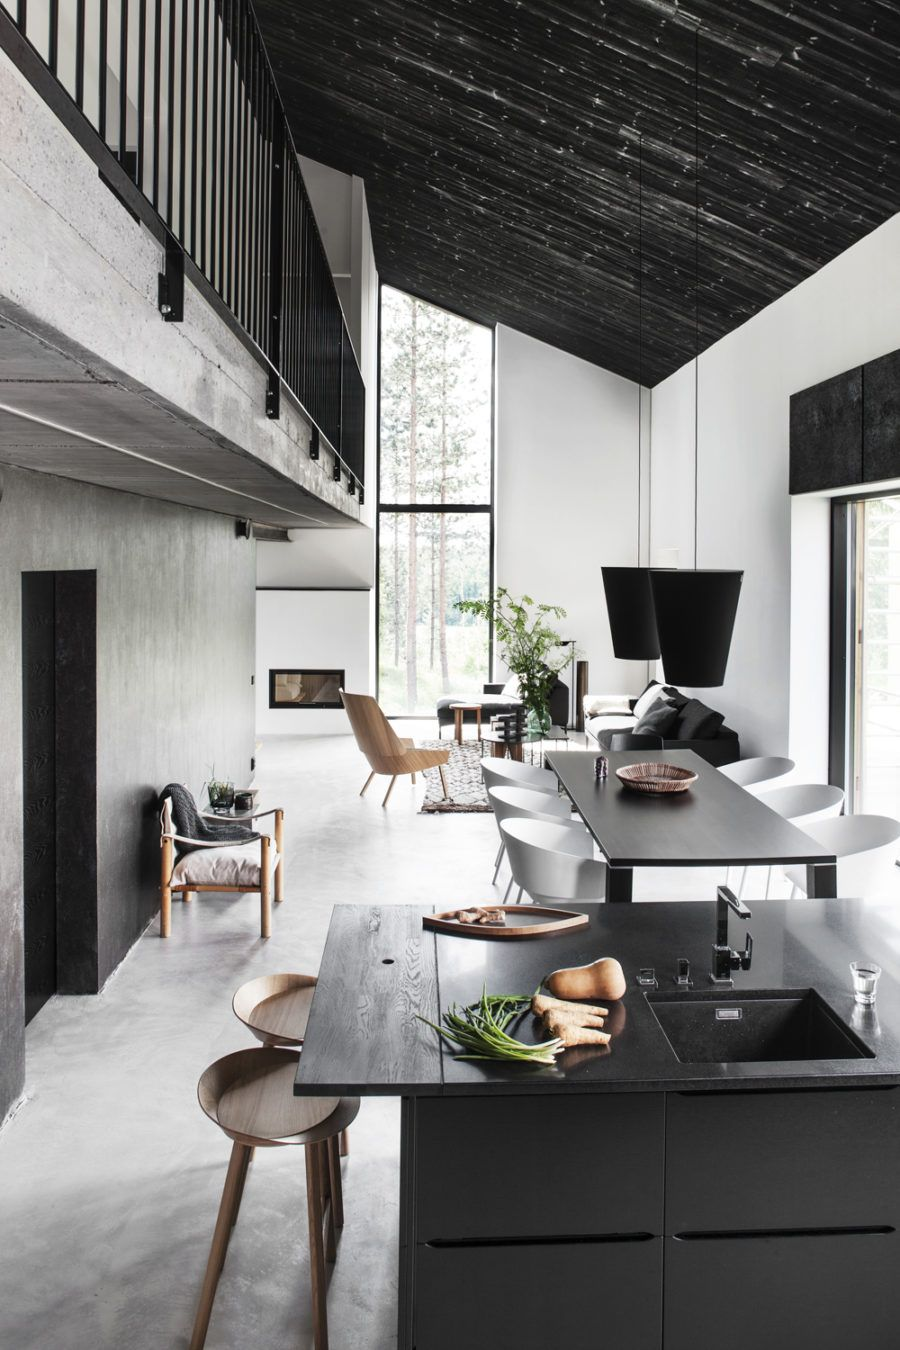 Deko S House Black Ceiling Design Ideas Pinterest Ceilings